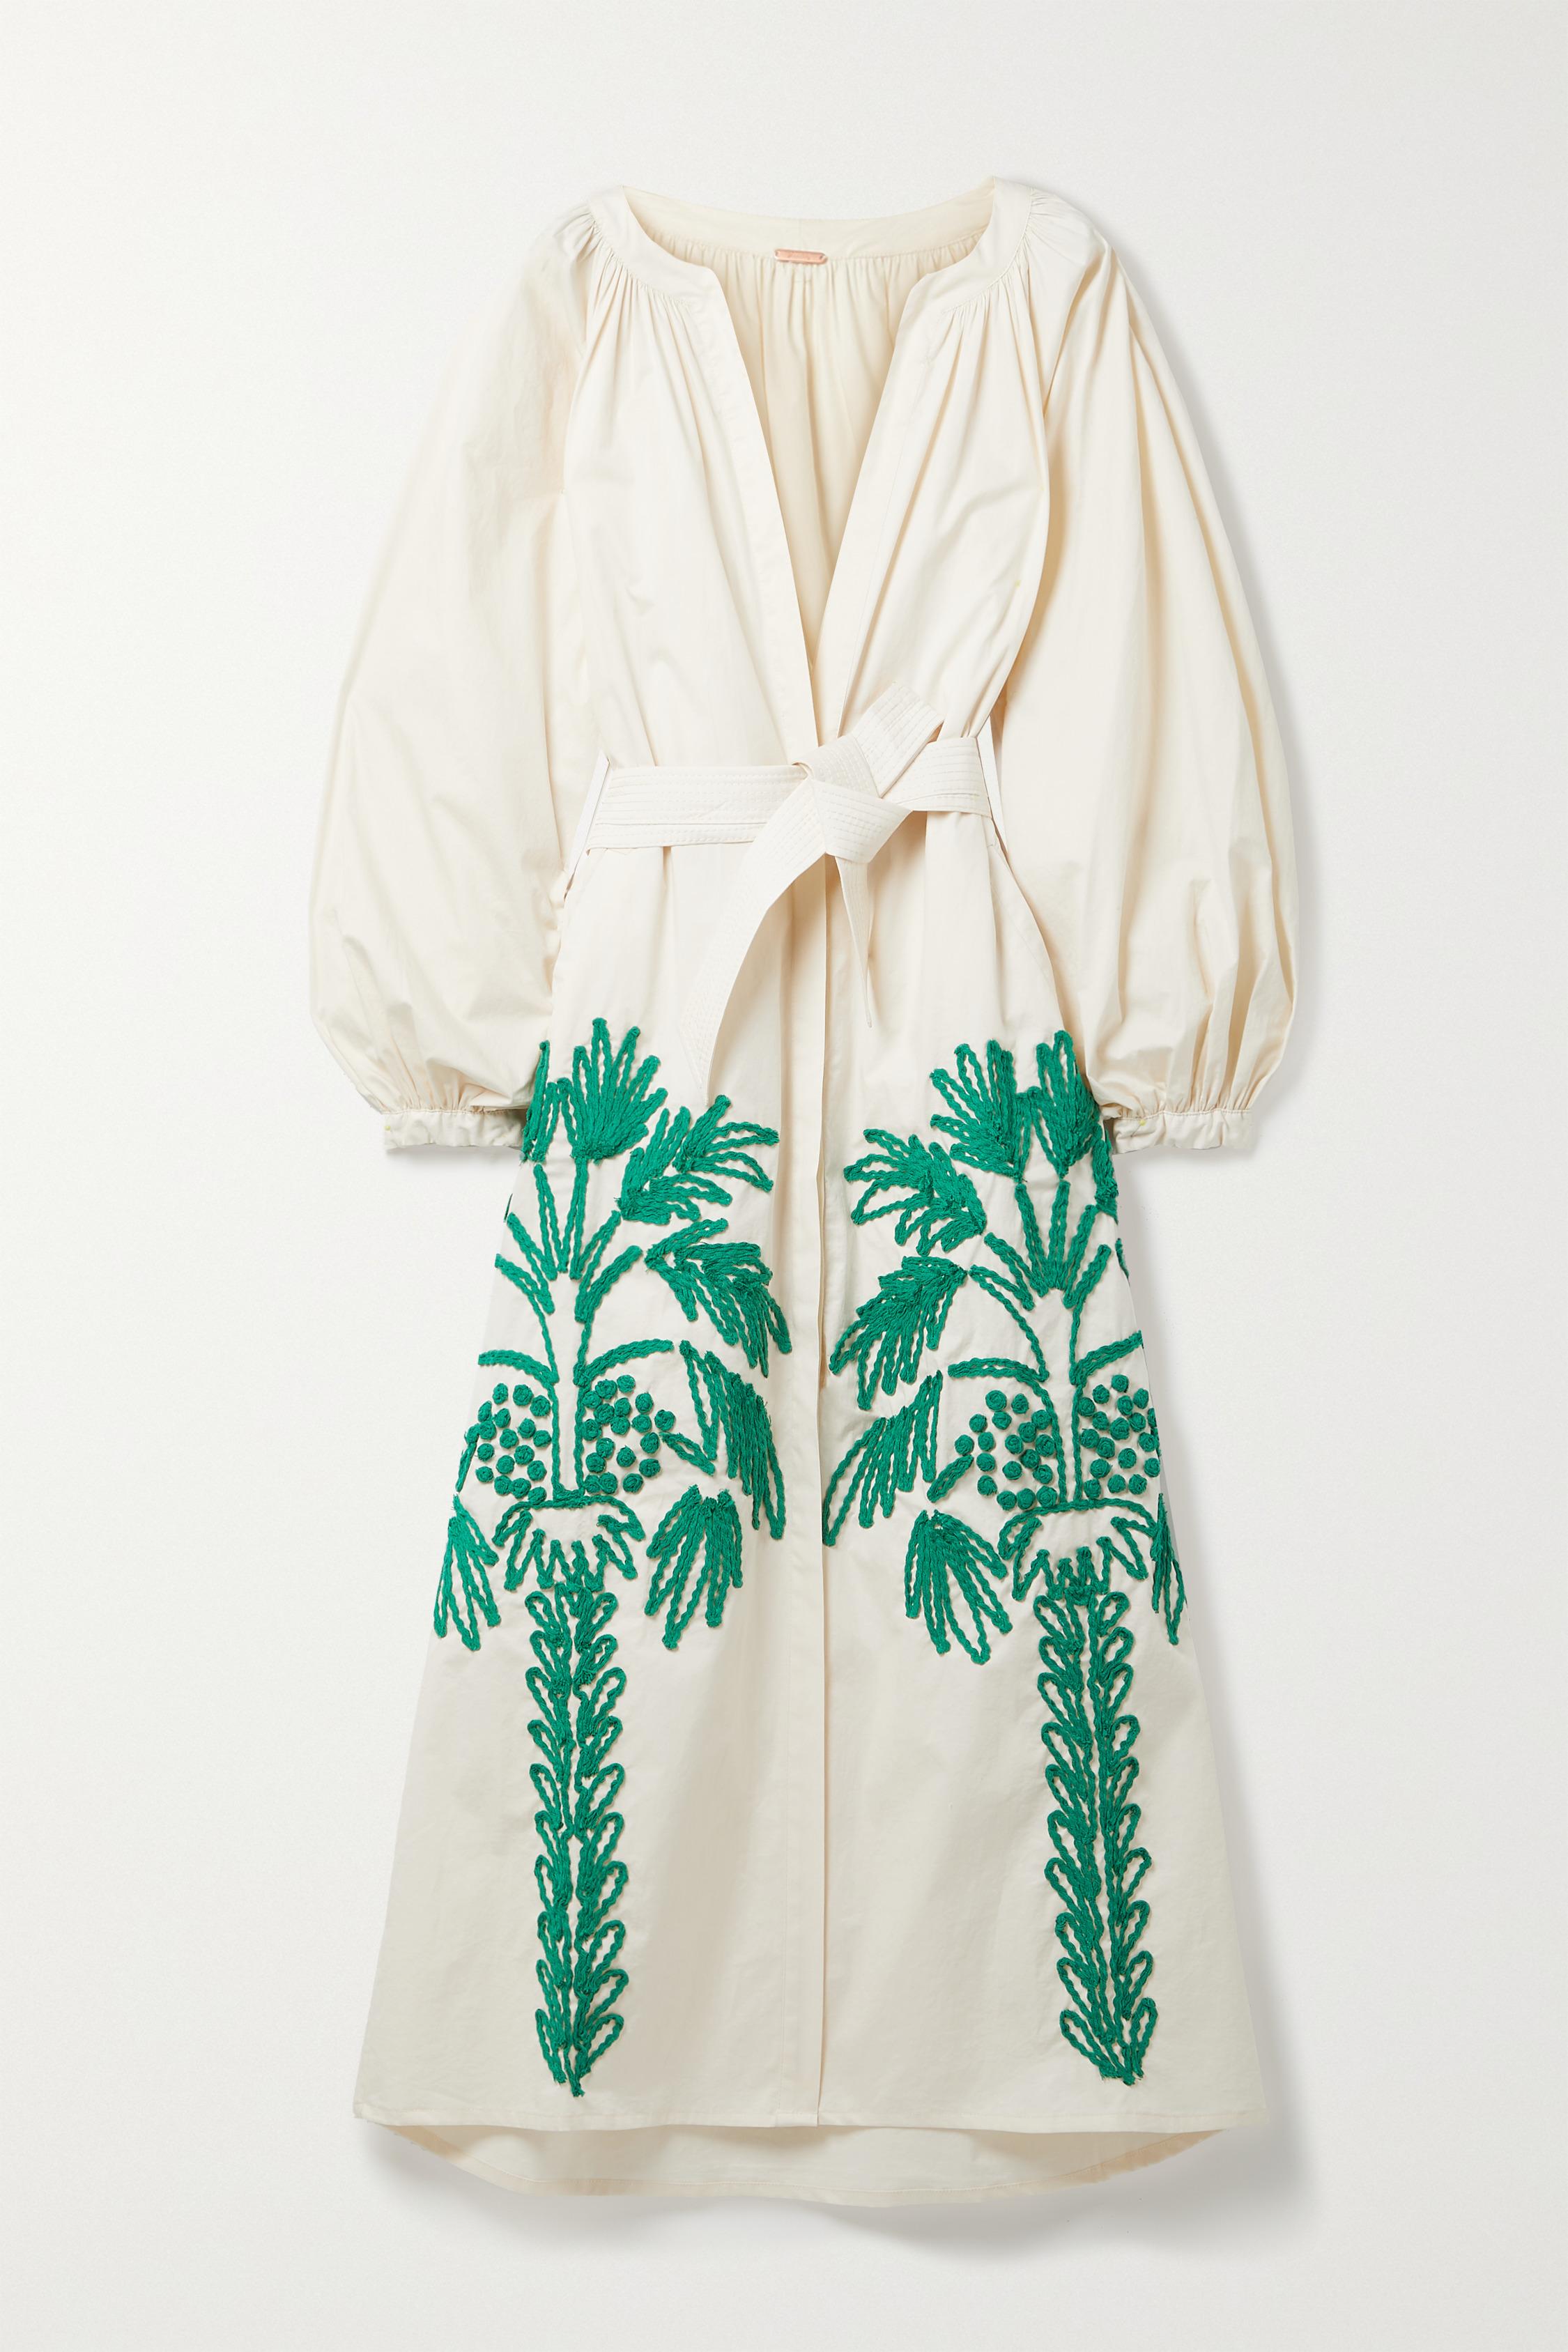 Net-a-Porter celebrates modest fashion ahead of Ramadan (фото 4)